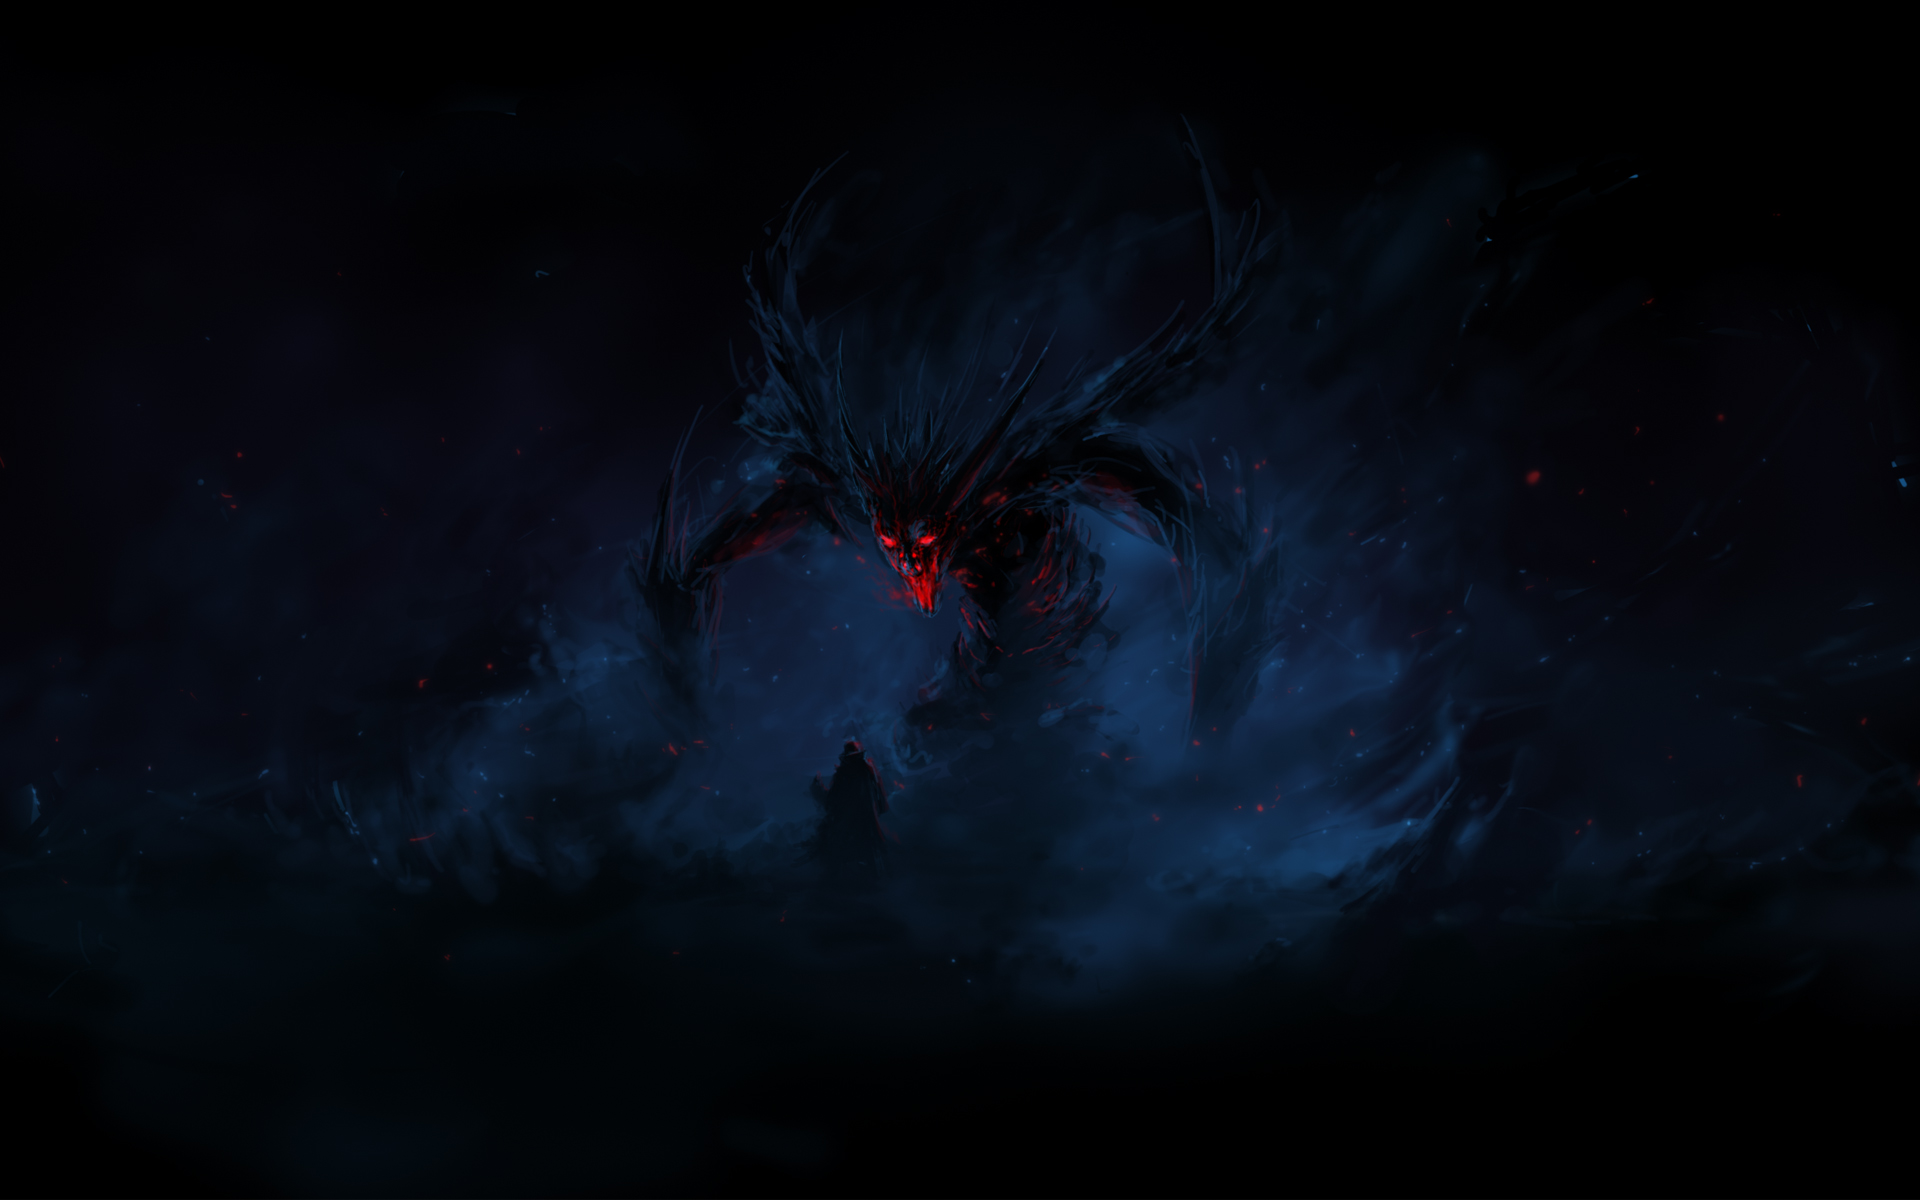 Dark Demon Wallpaper 1920x1200 Dark Demon 1920x1200